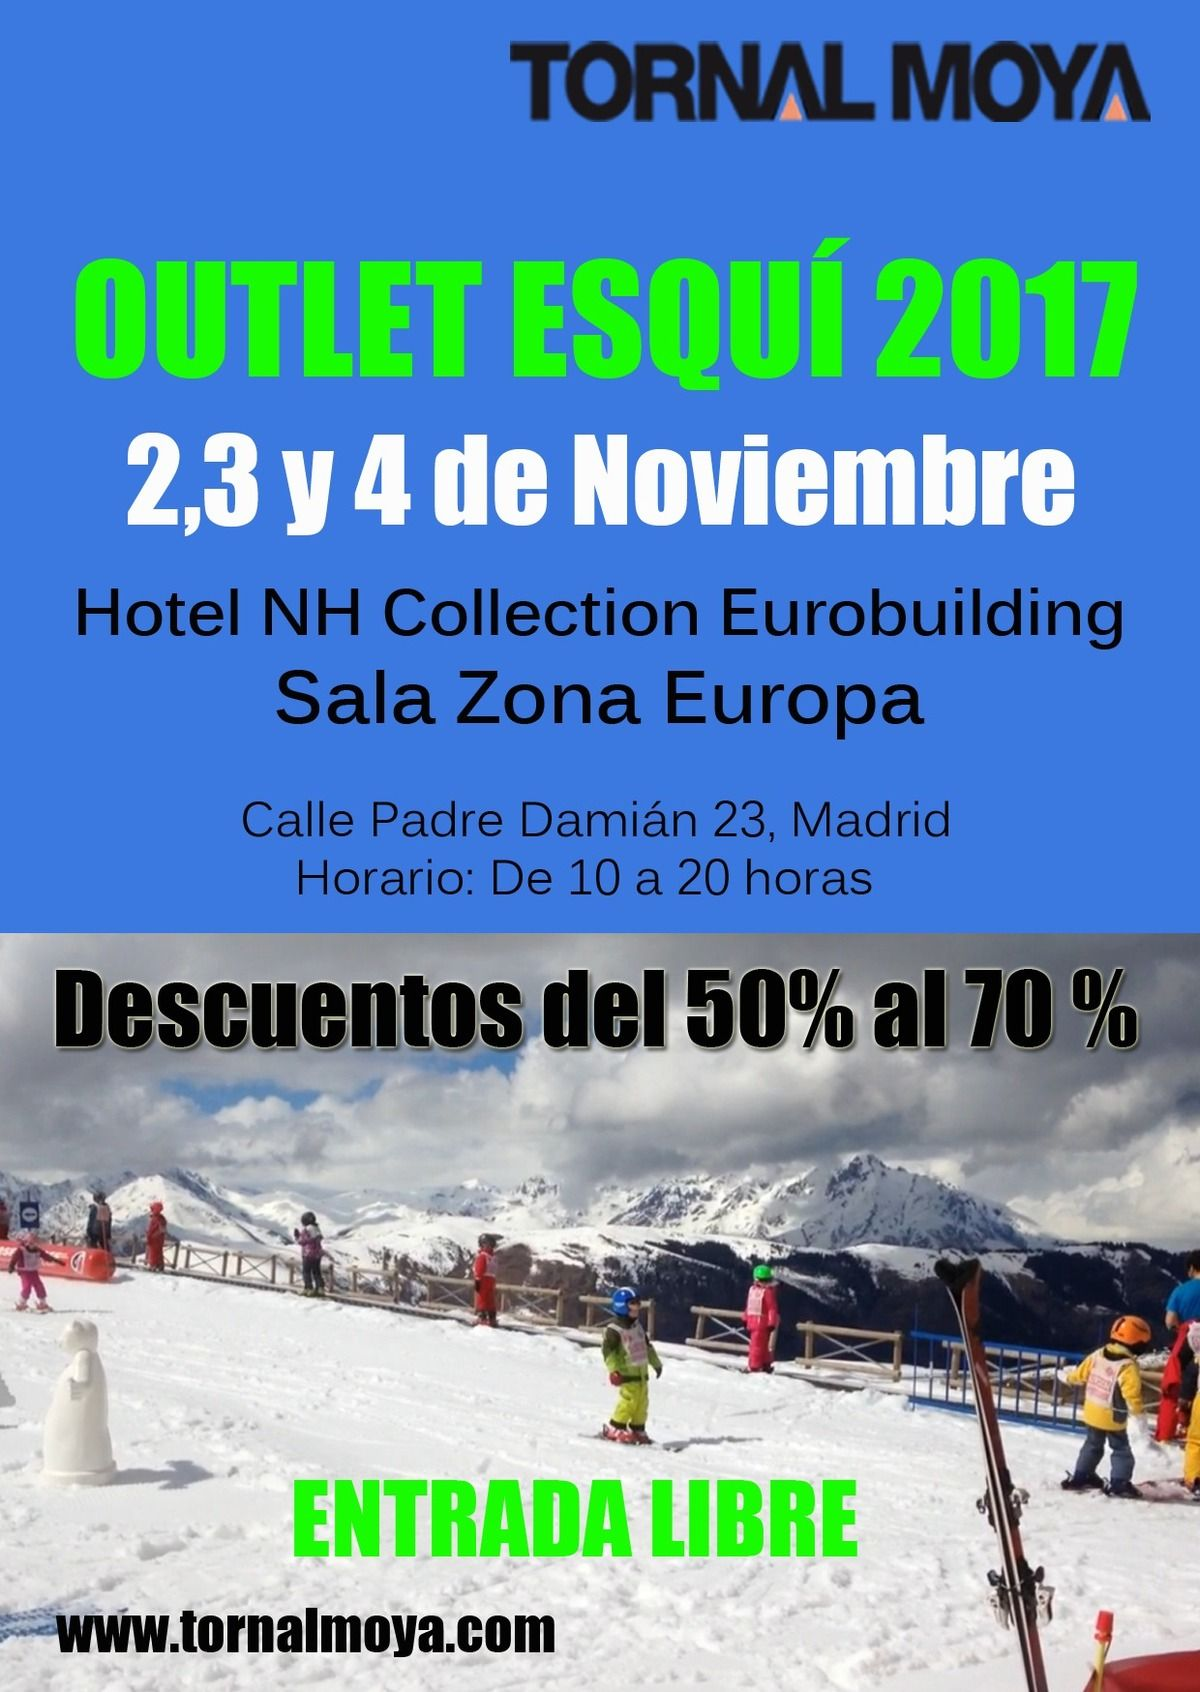 Outlet de esquí Tornal Moya Madrid 2017